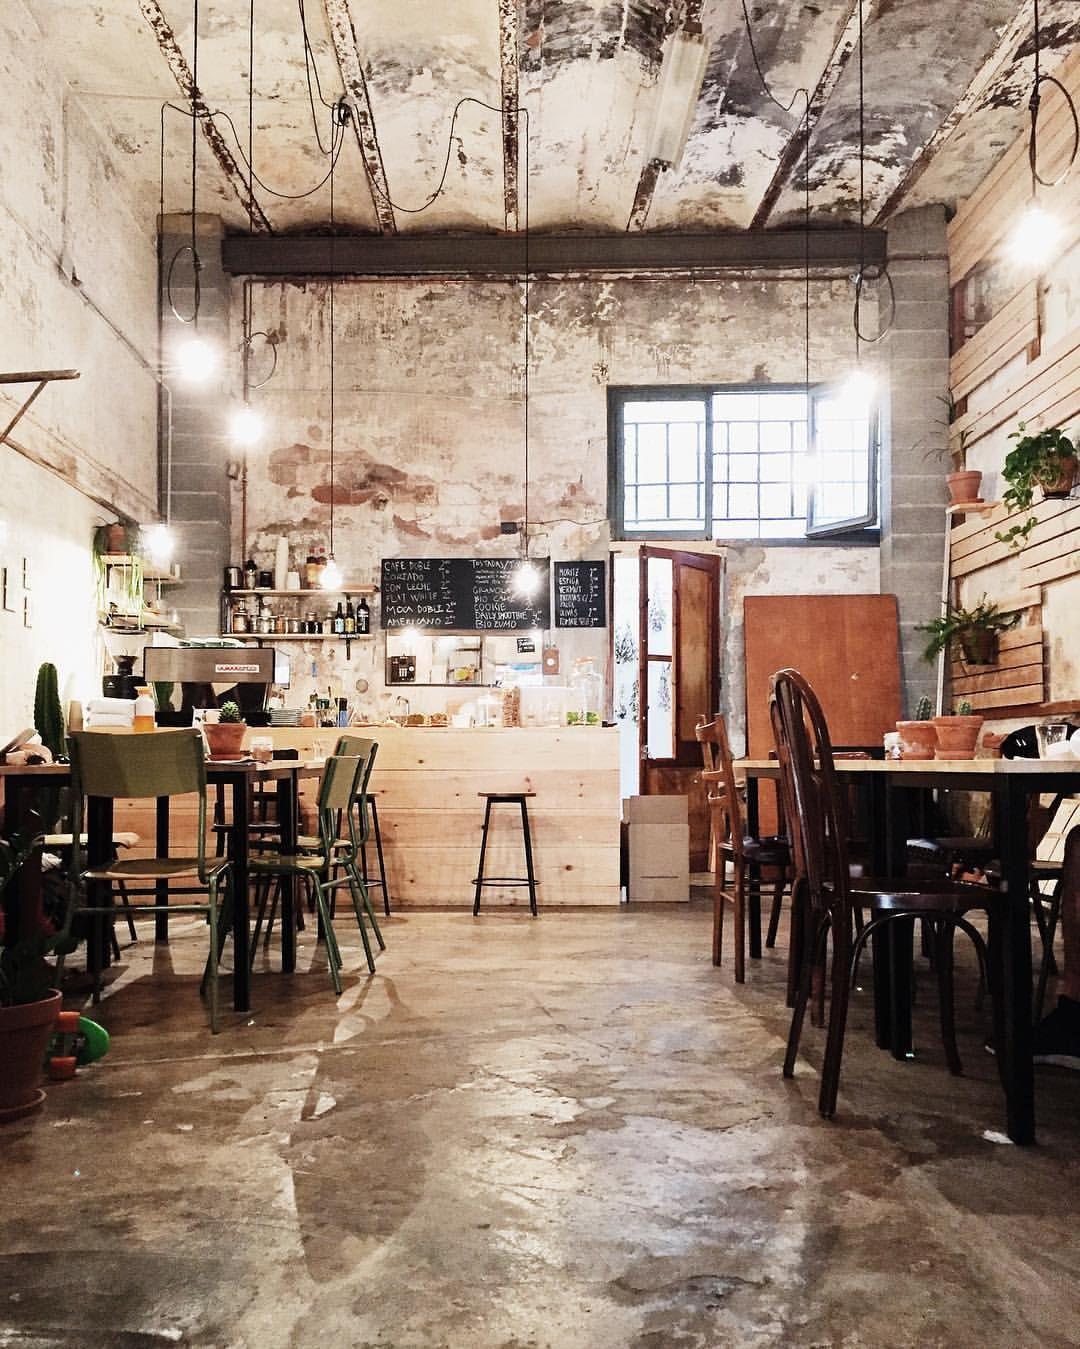 Espaijoliu caf in barcelona spots wanderlust for Raumgestaltung cafe